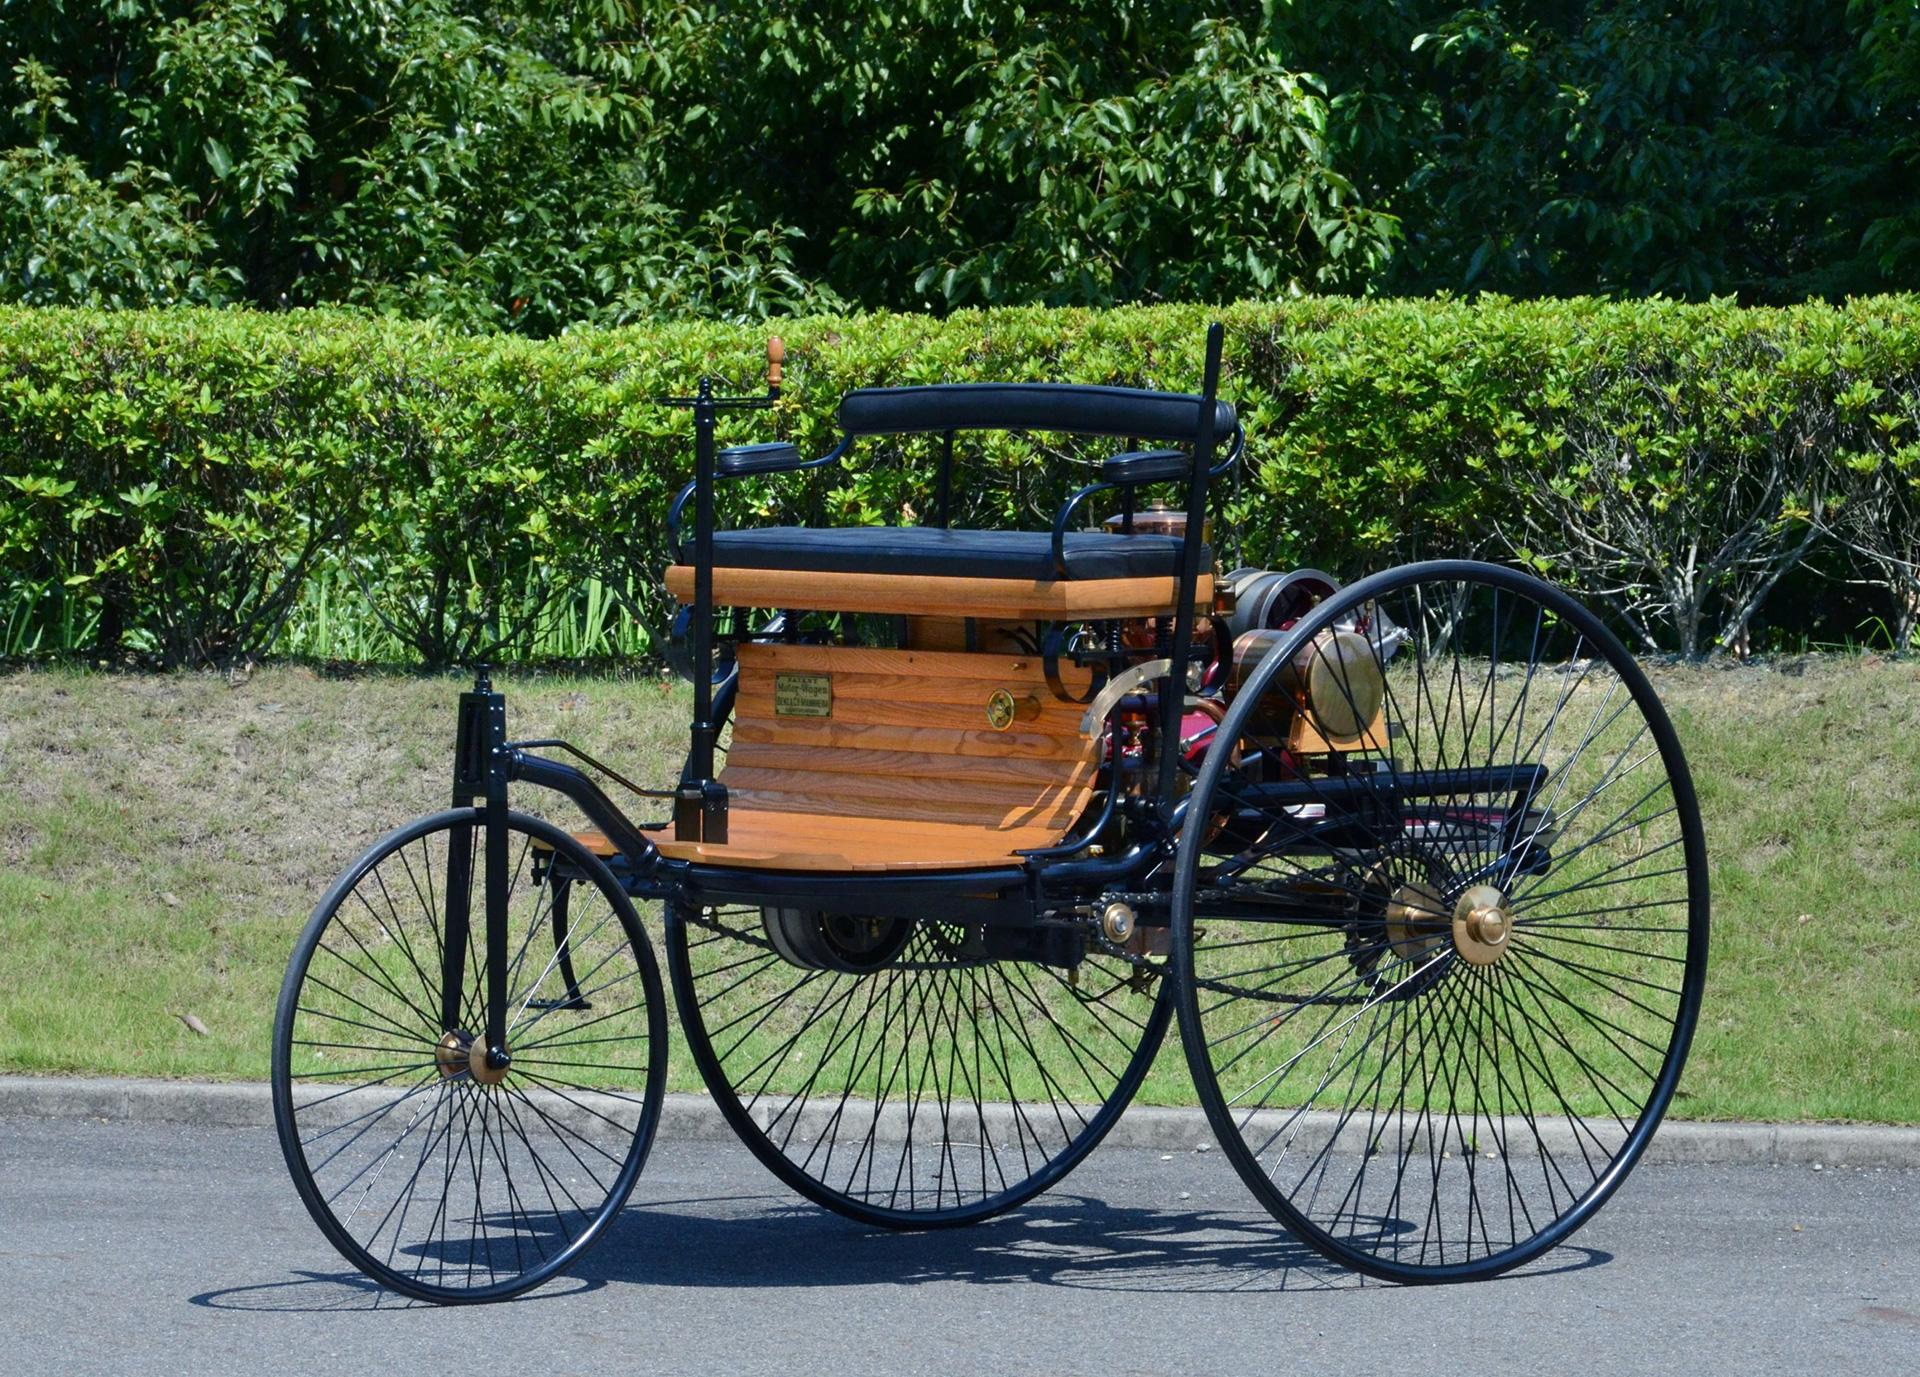 benz patent motorwagen replica display toyota global newsroom. Black Bedroom Furniture Sets. Home Design Ideas